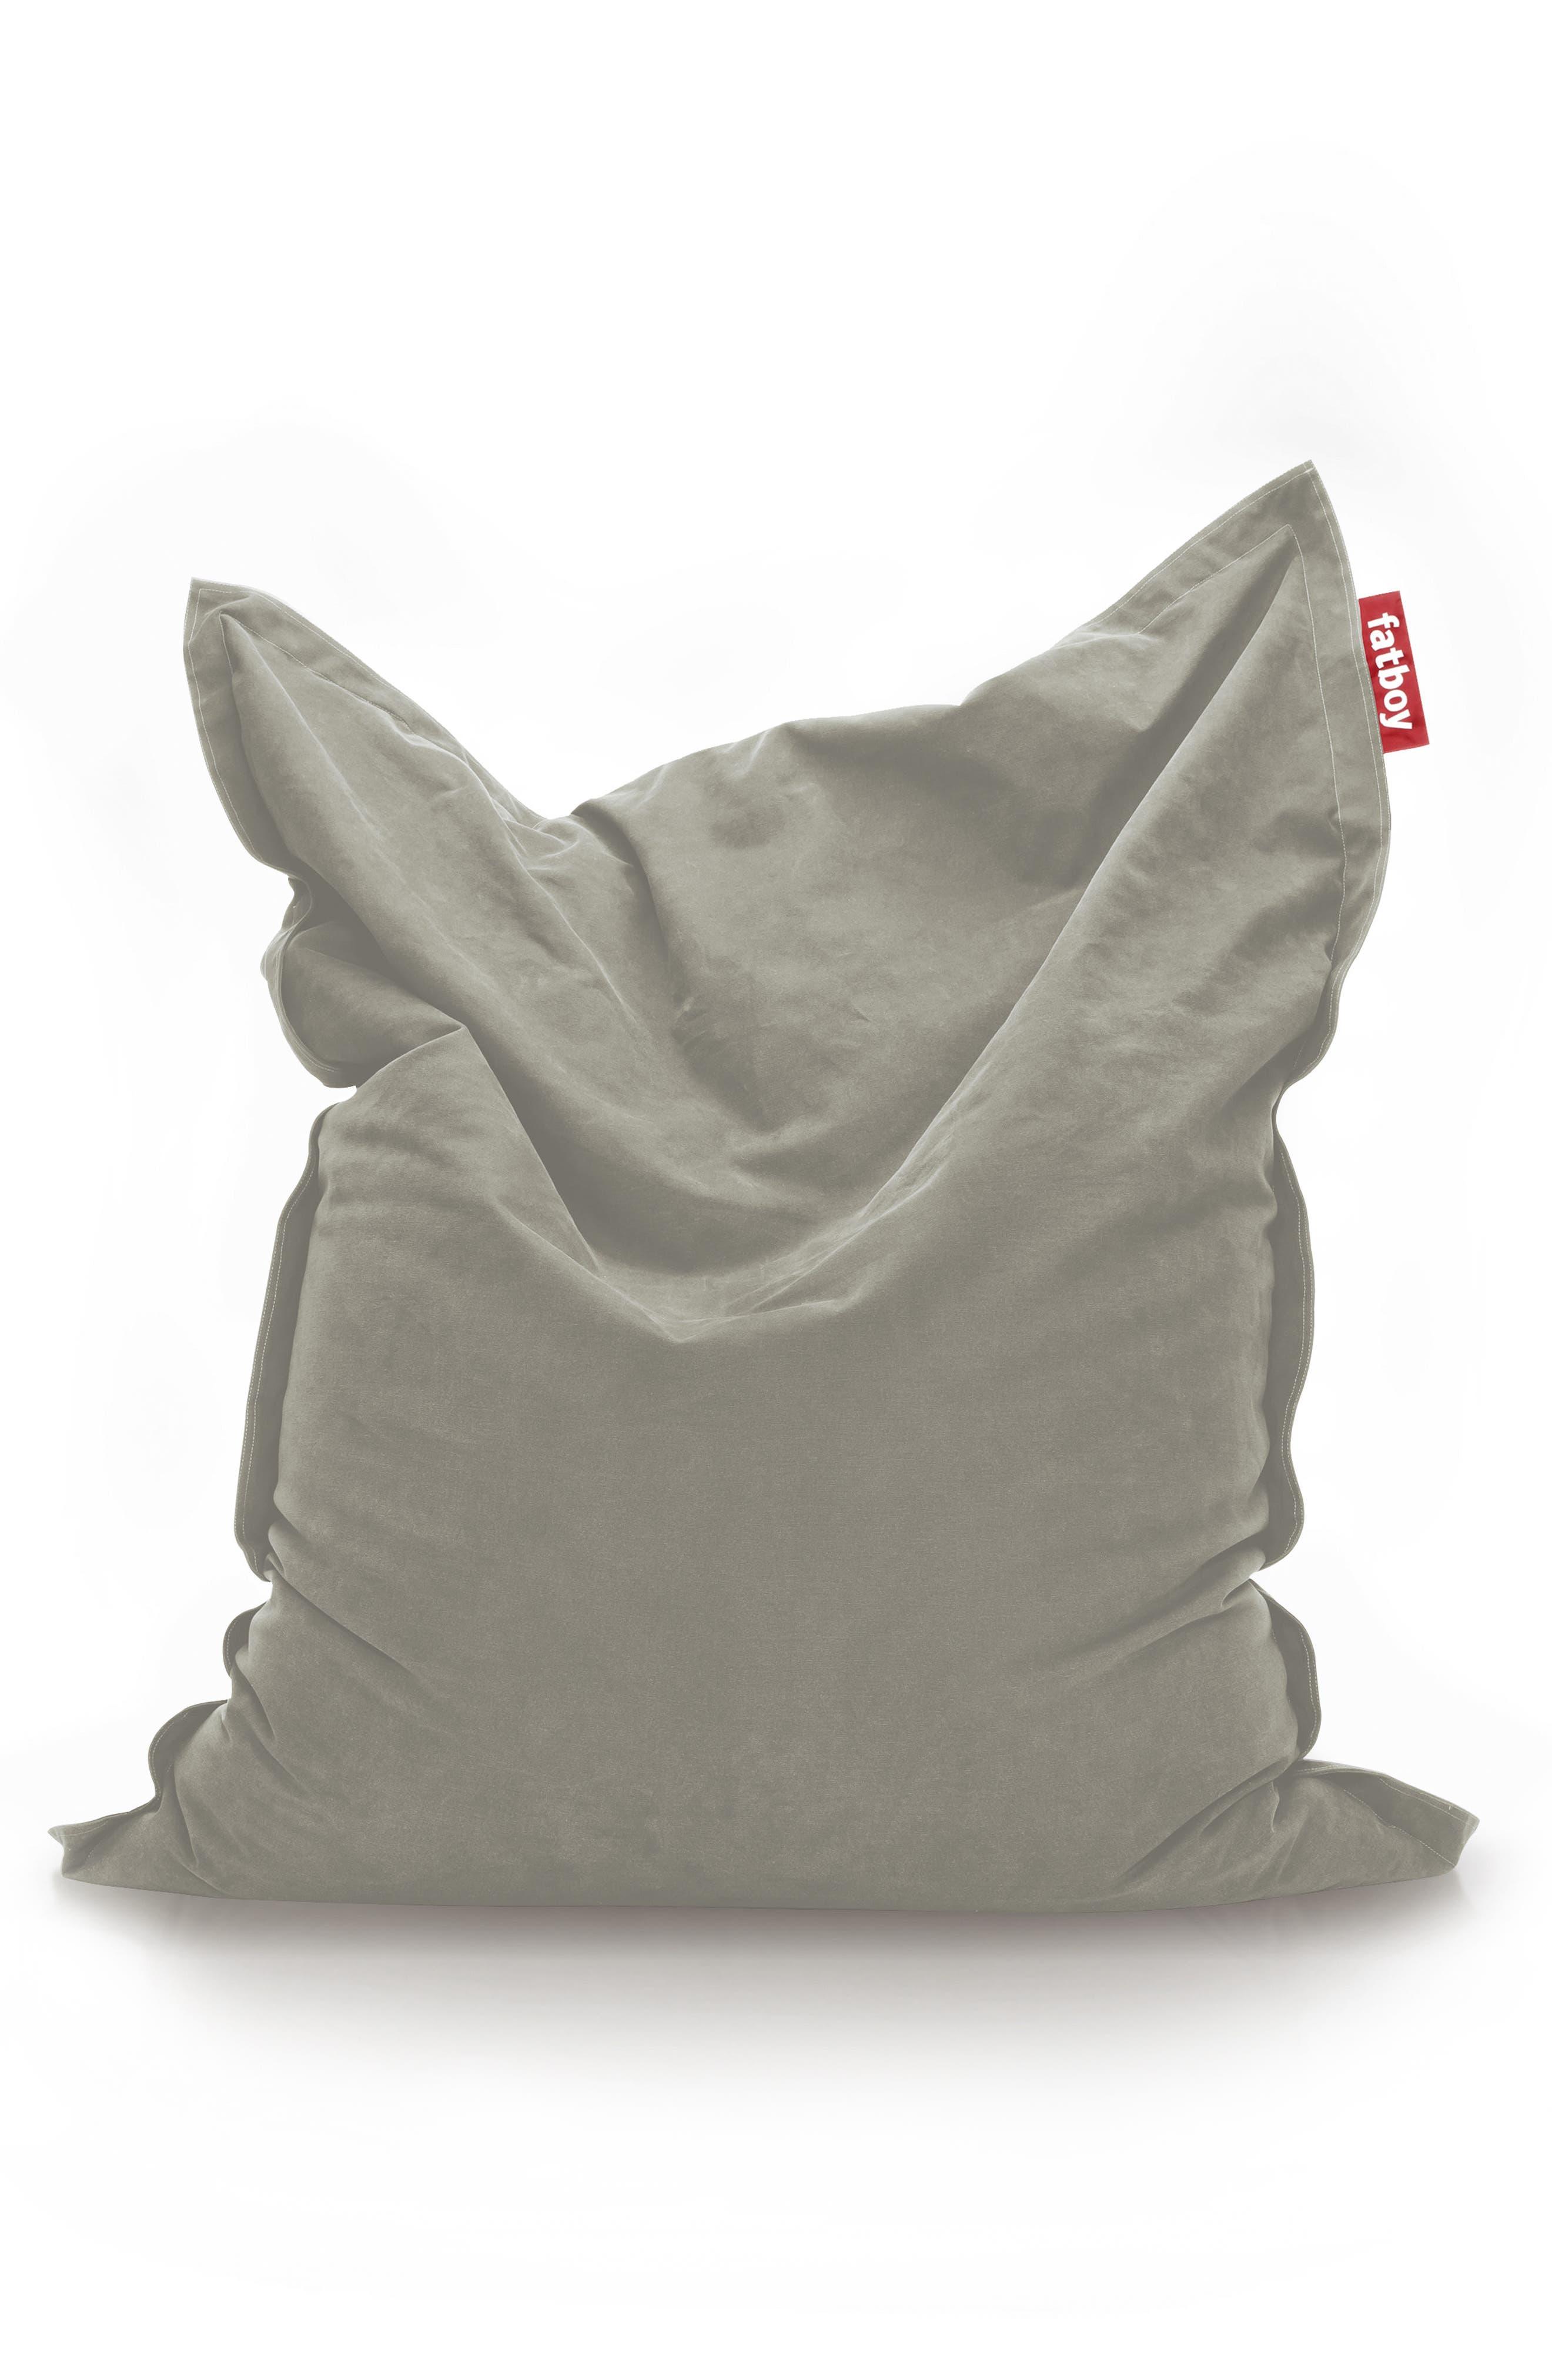 interiors bean pin poufs and furniture pinterest bag fatboy bags